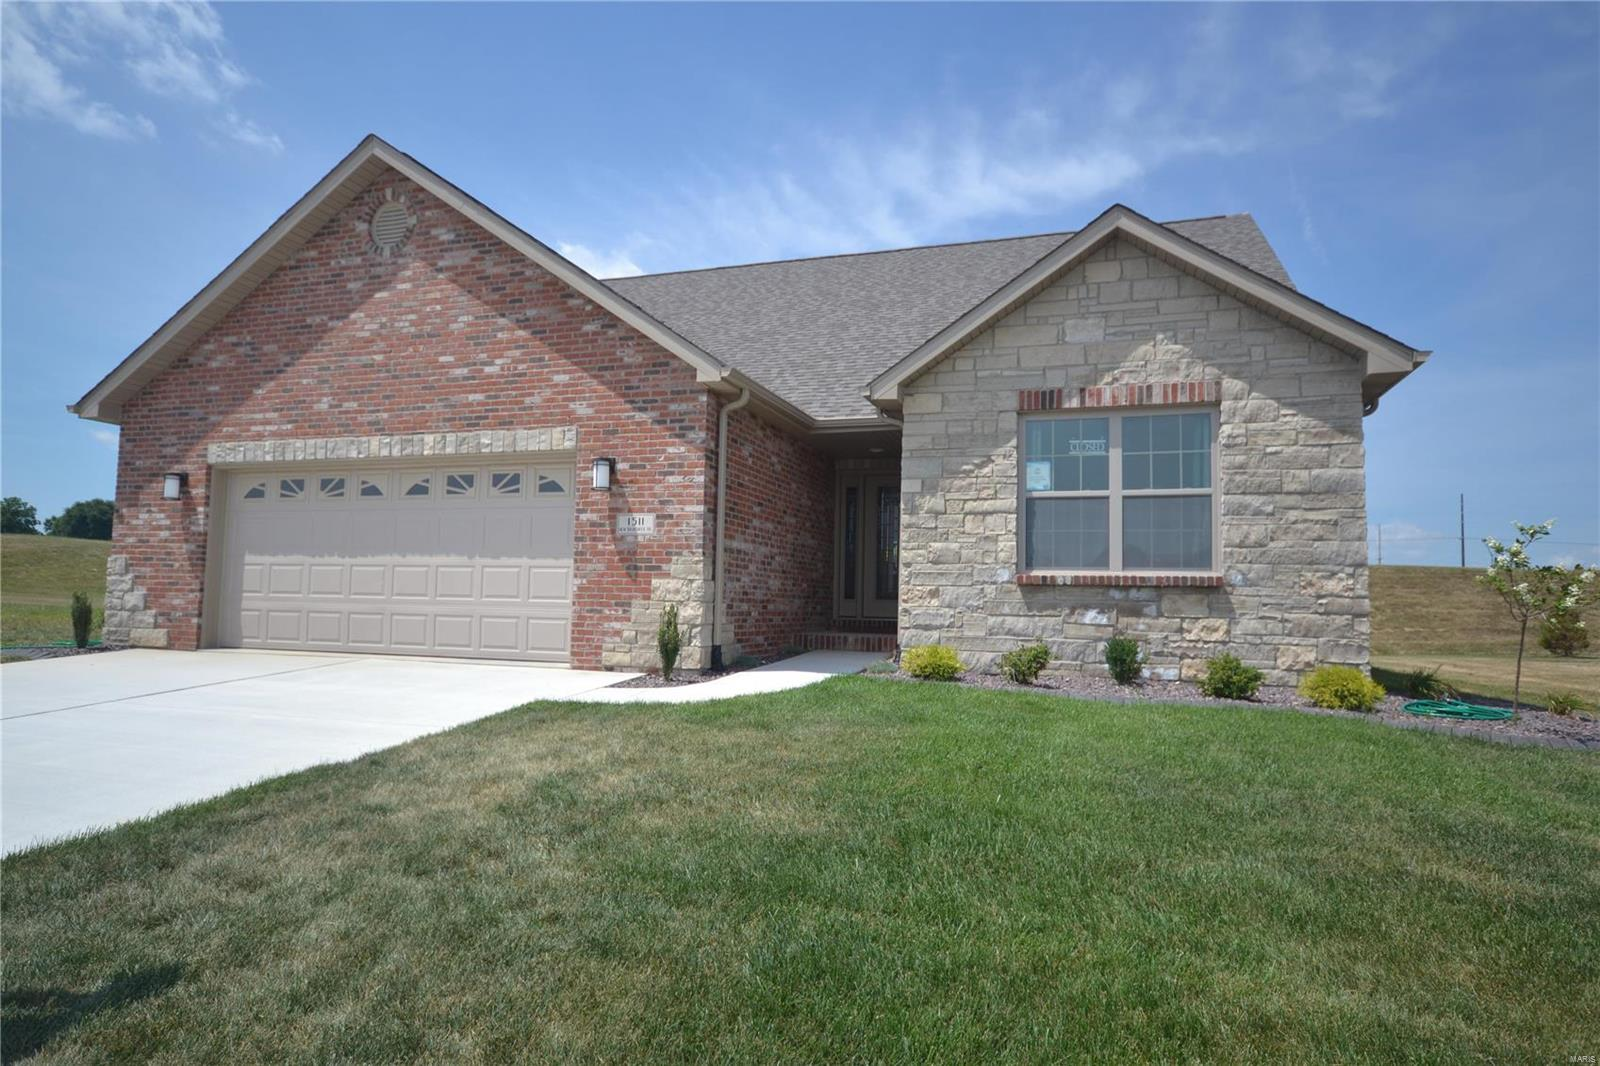 4412 TBB Devin Drive Property Photo - Smithton, IL real estate listing